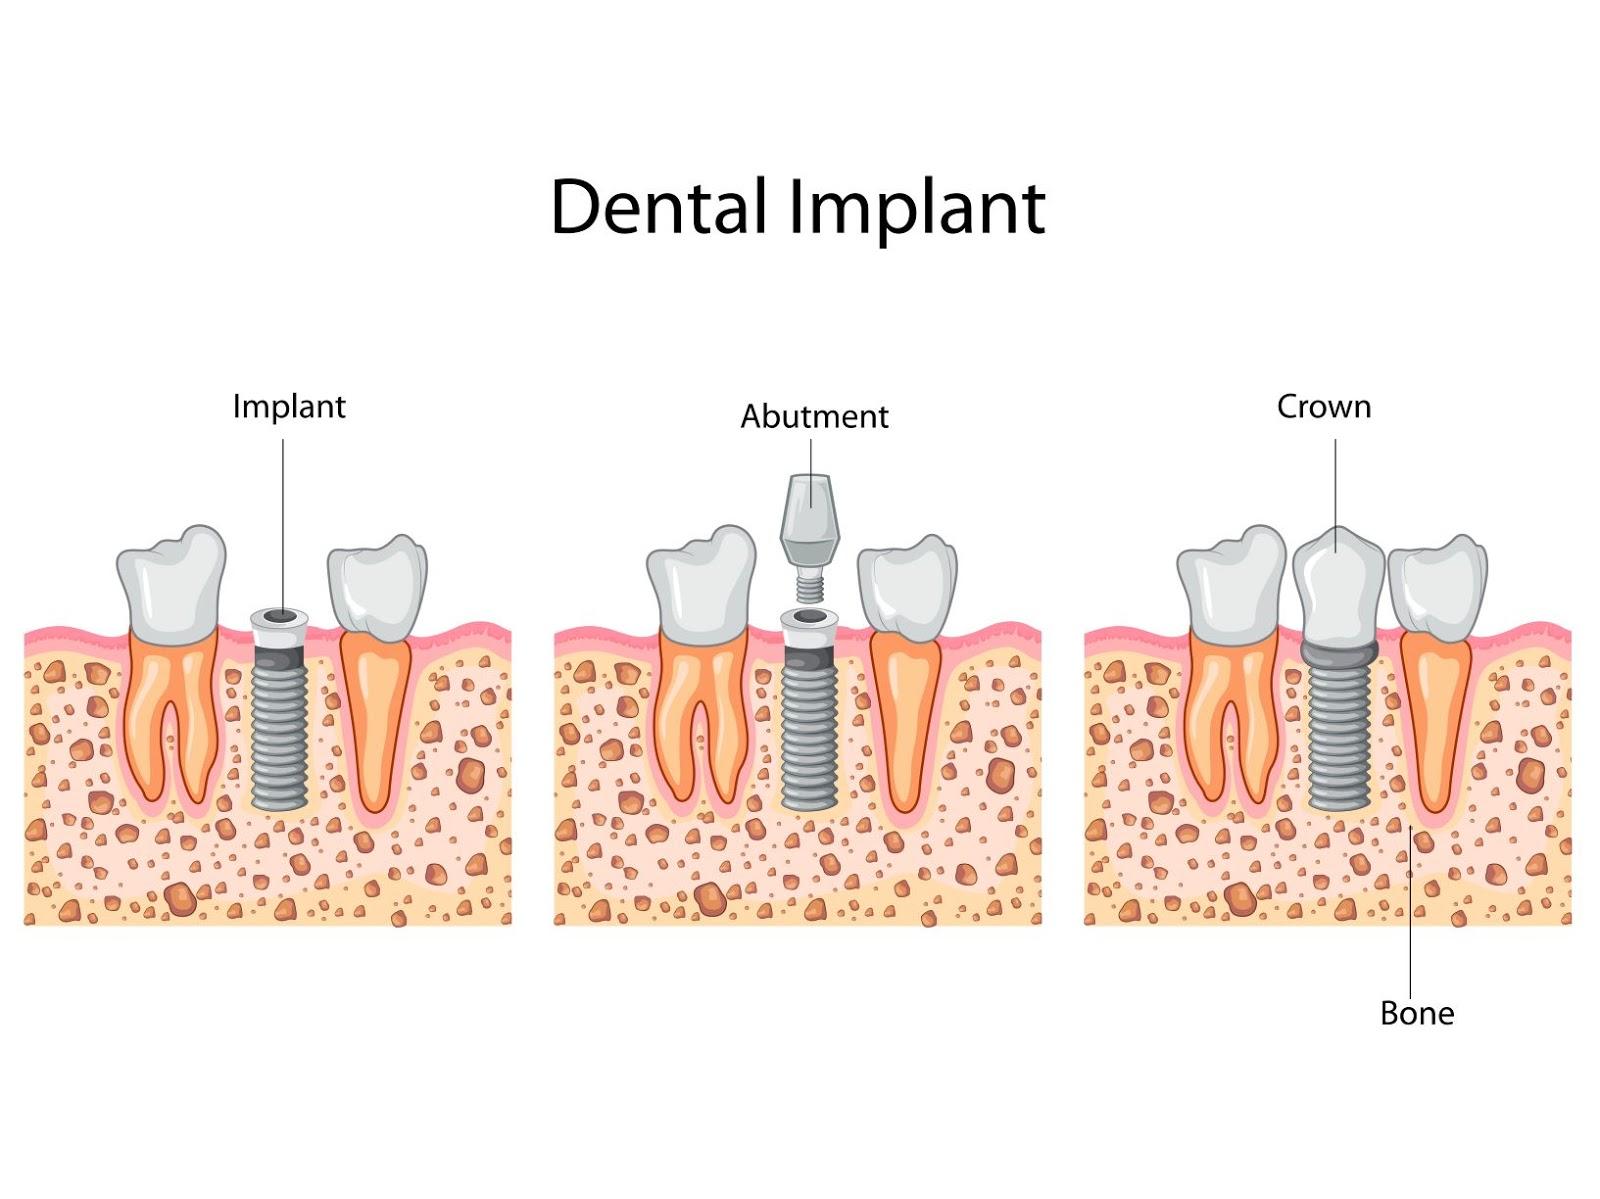 The dental implant procedure